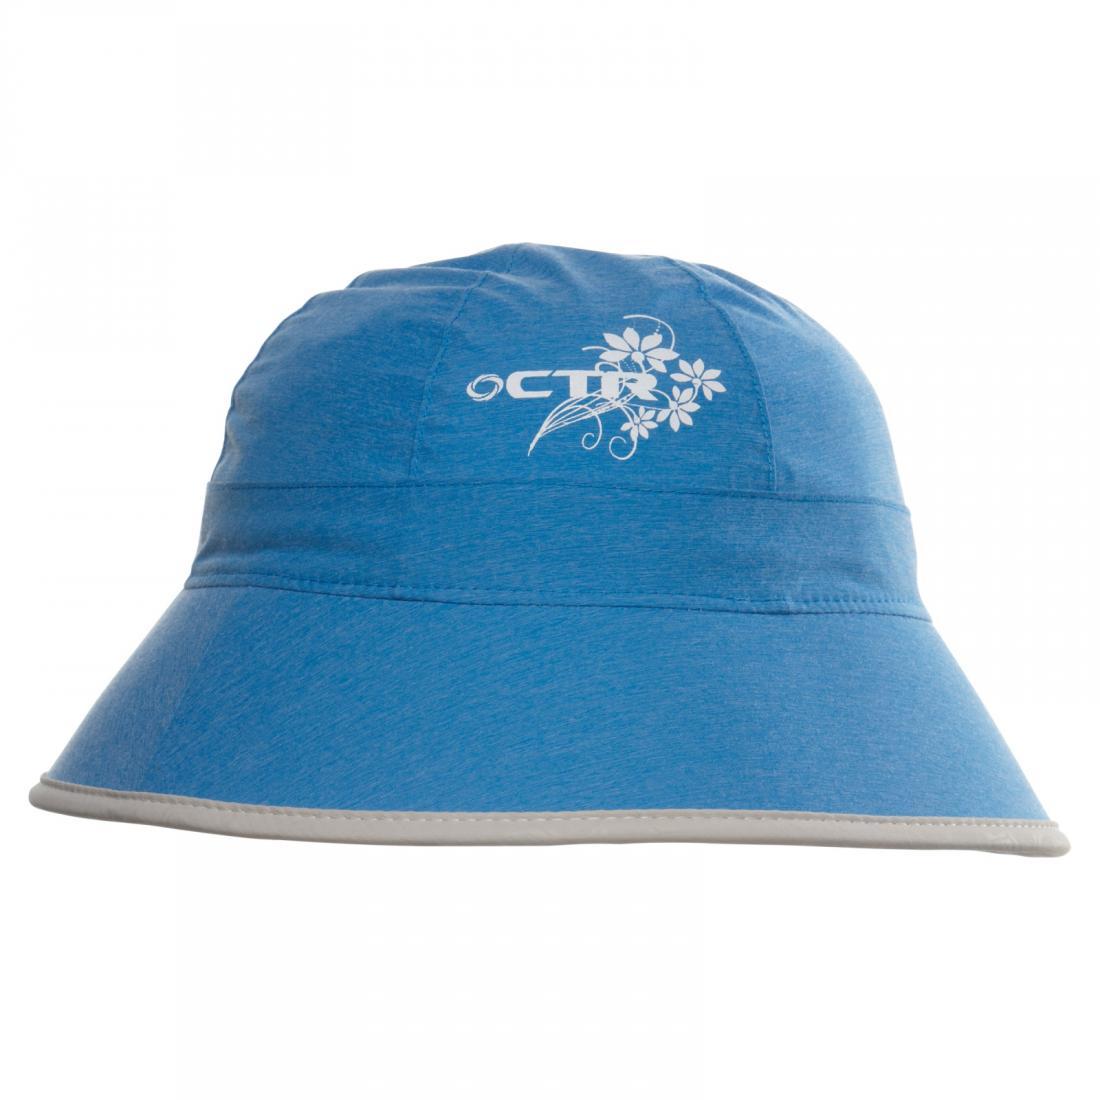 Панама Chaos  Stratus Cloche Rain Hat (женс)Панамы<br><br><br>Цвет: Голубой<br>Размер: L-XL